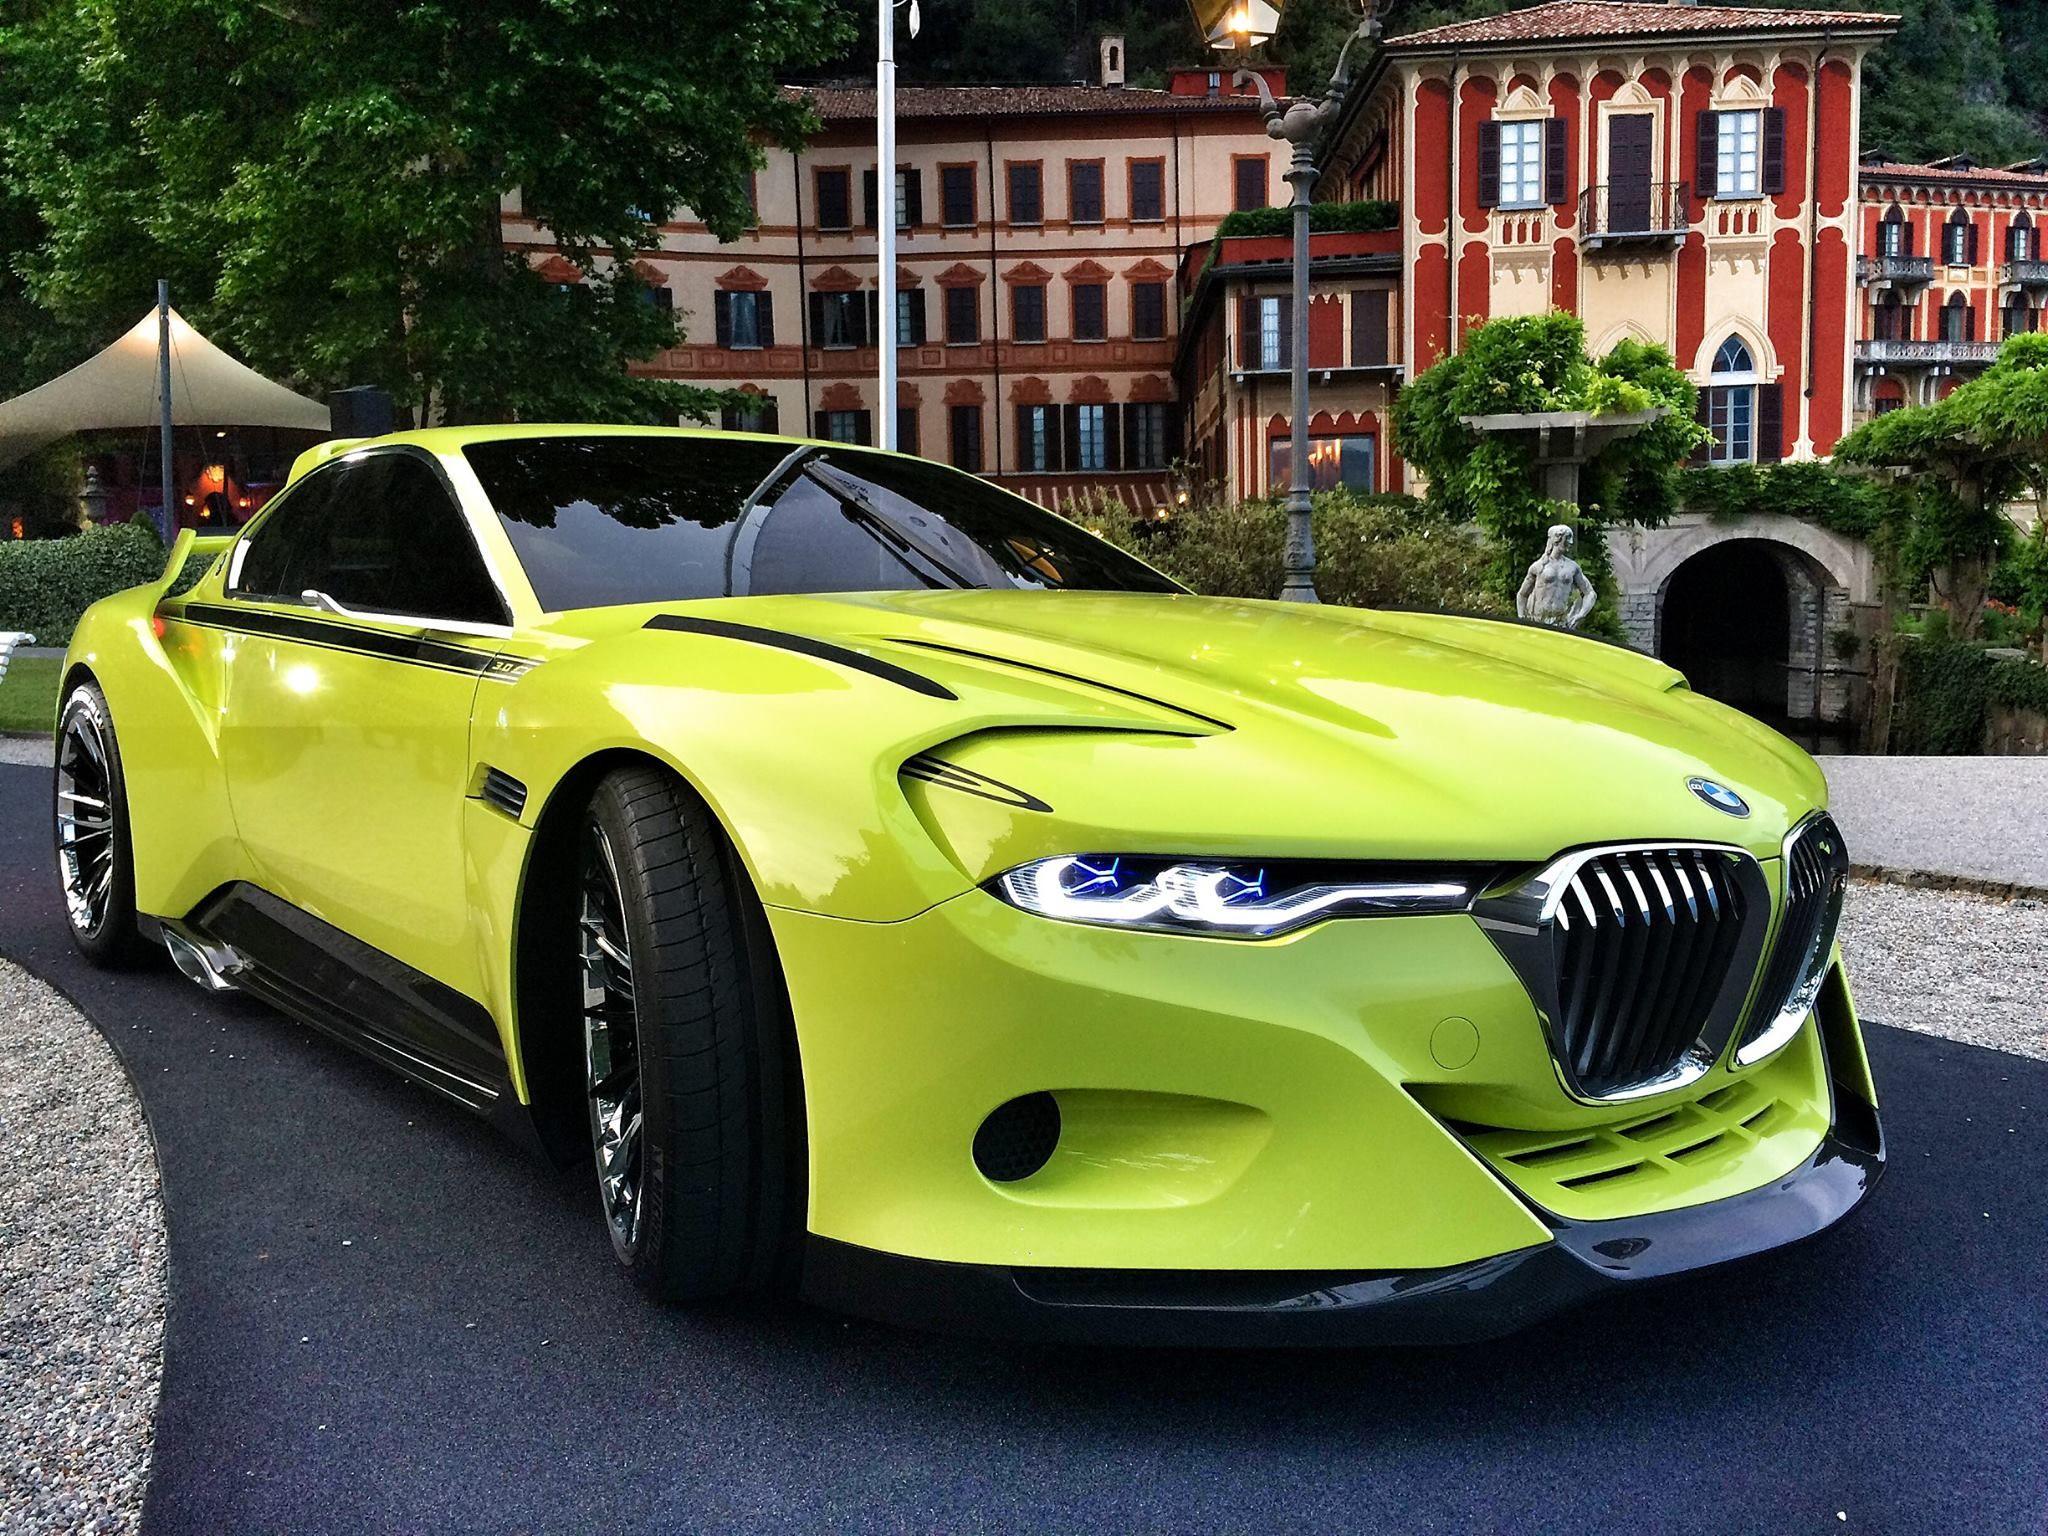 Bmw 3 0 Csl Hommage Concept Bmw 3 0 Csl Bmw Sports Cars Luxury